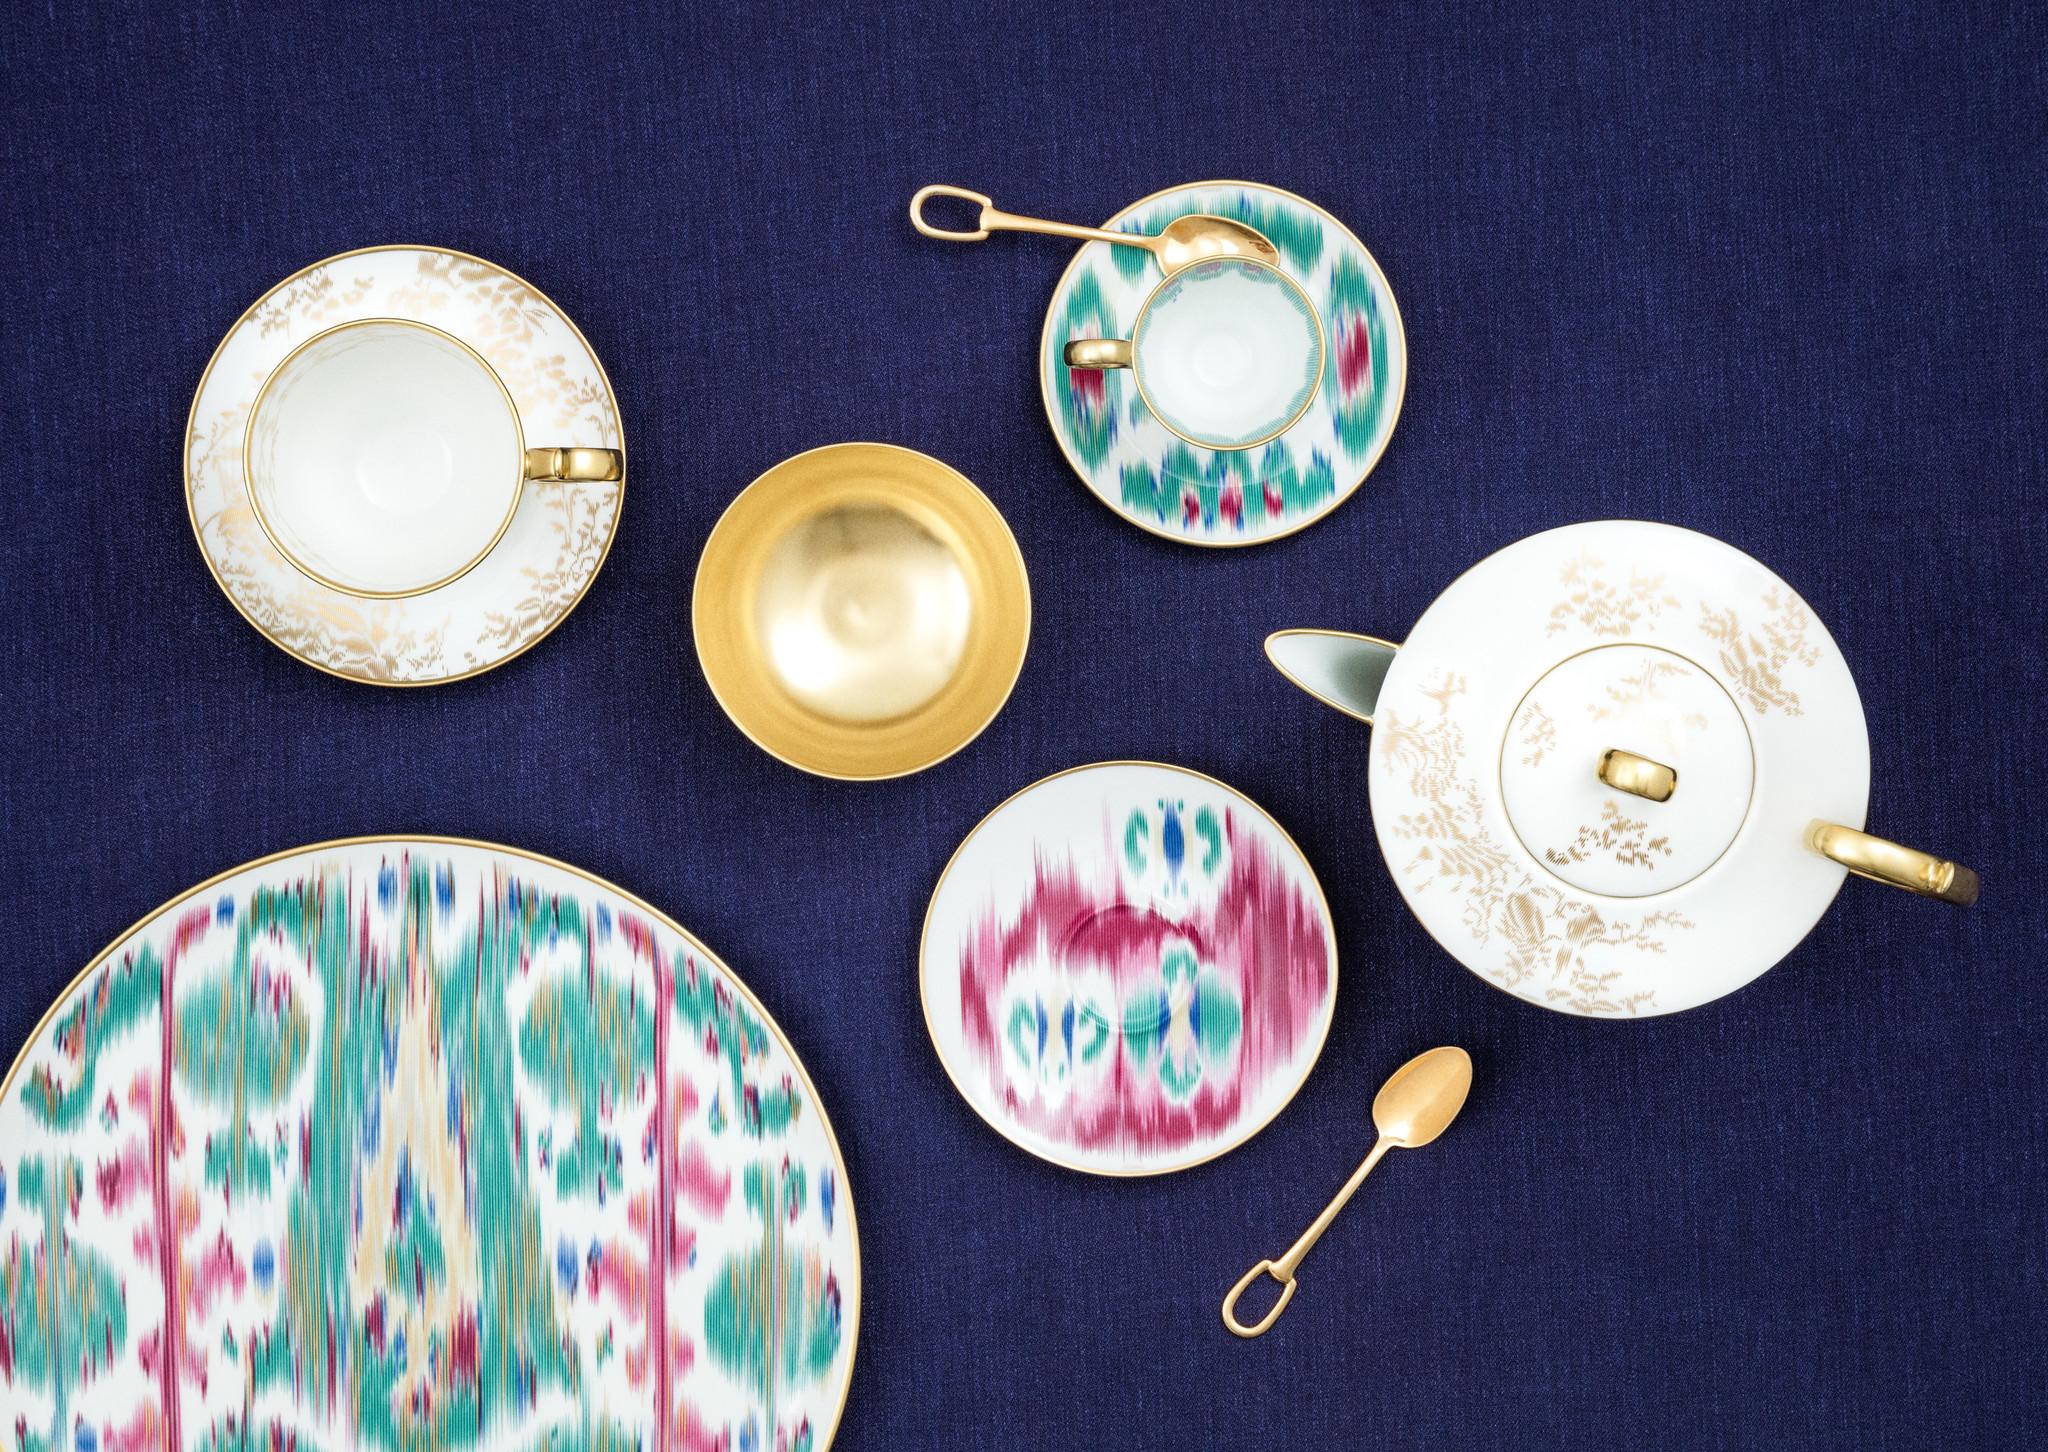 Hermes Voyage en Ikat Cereal Plate